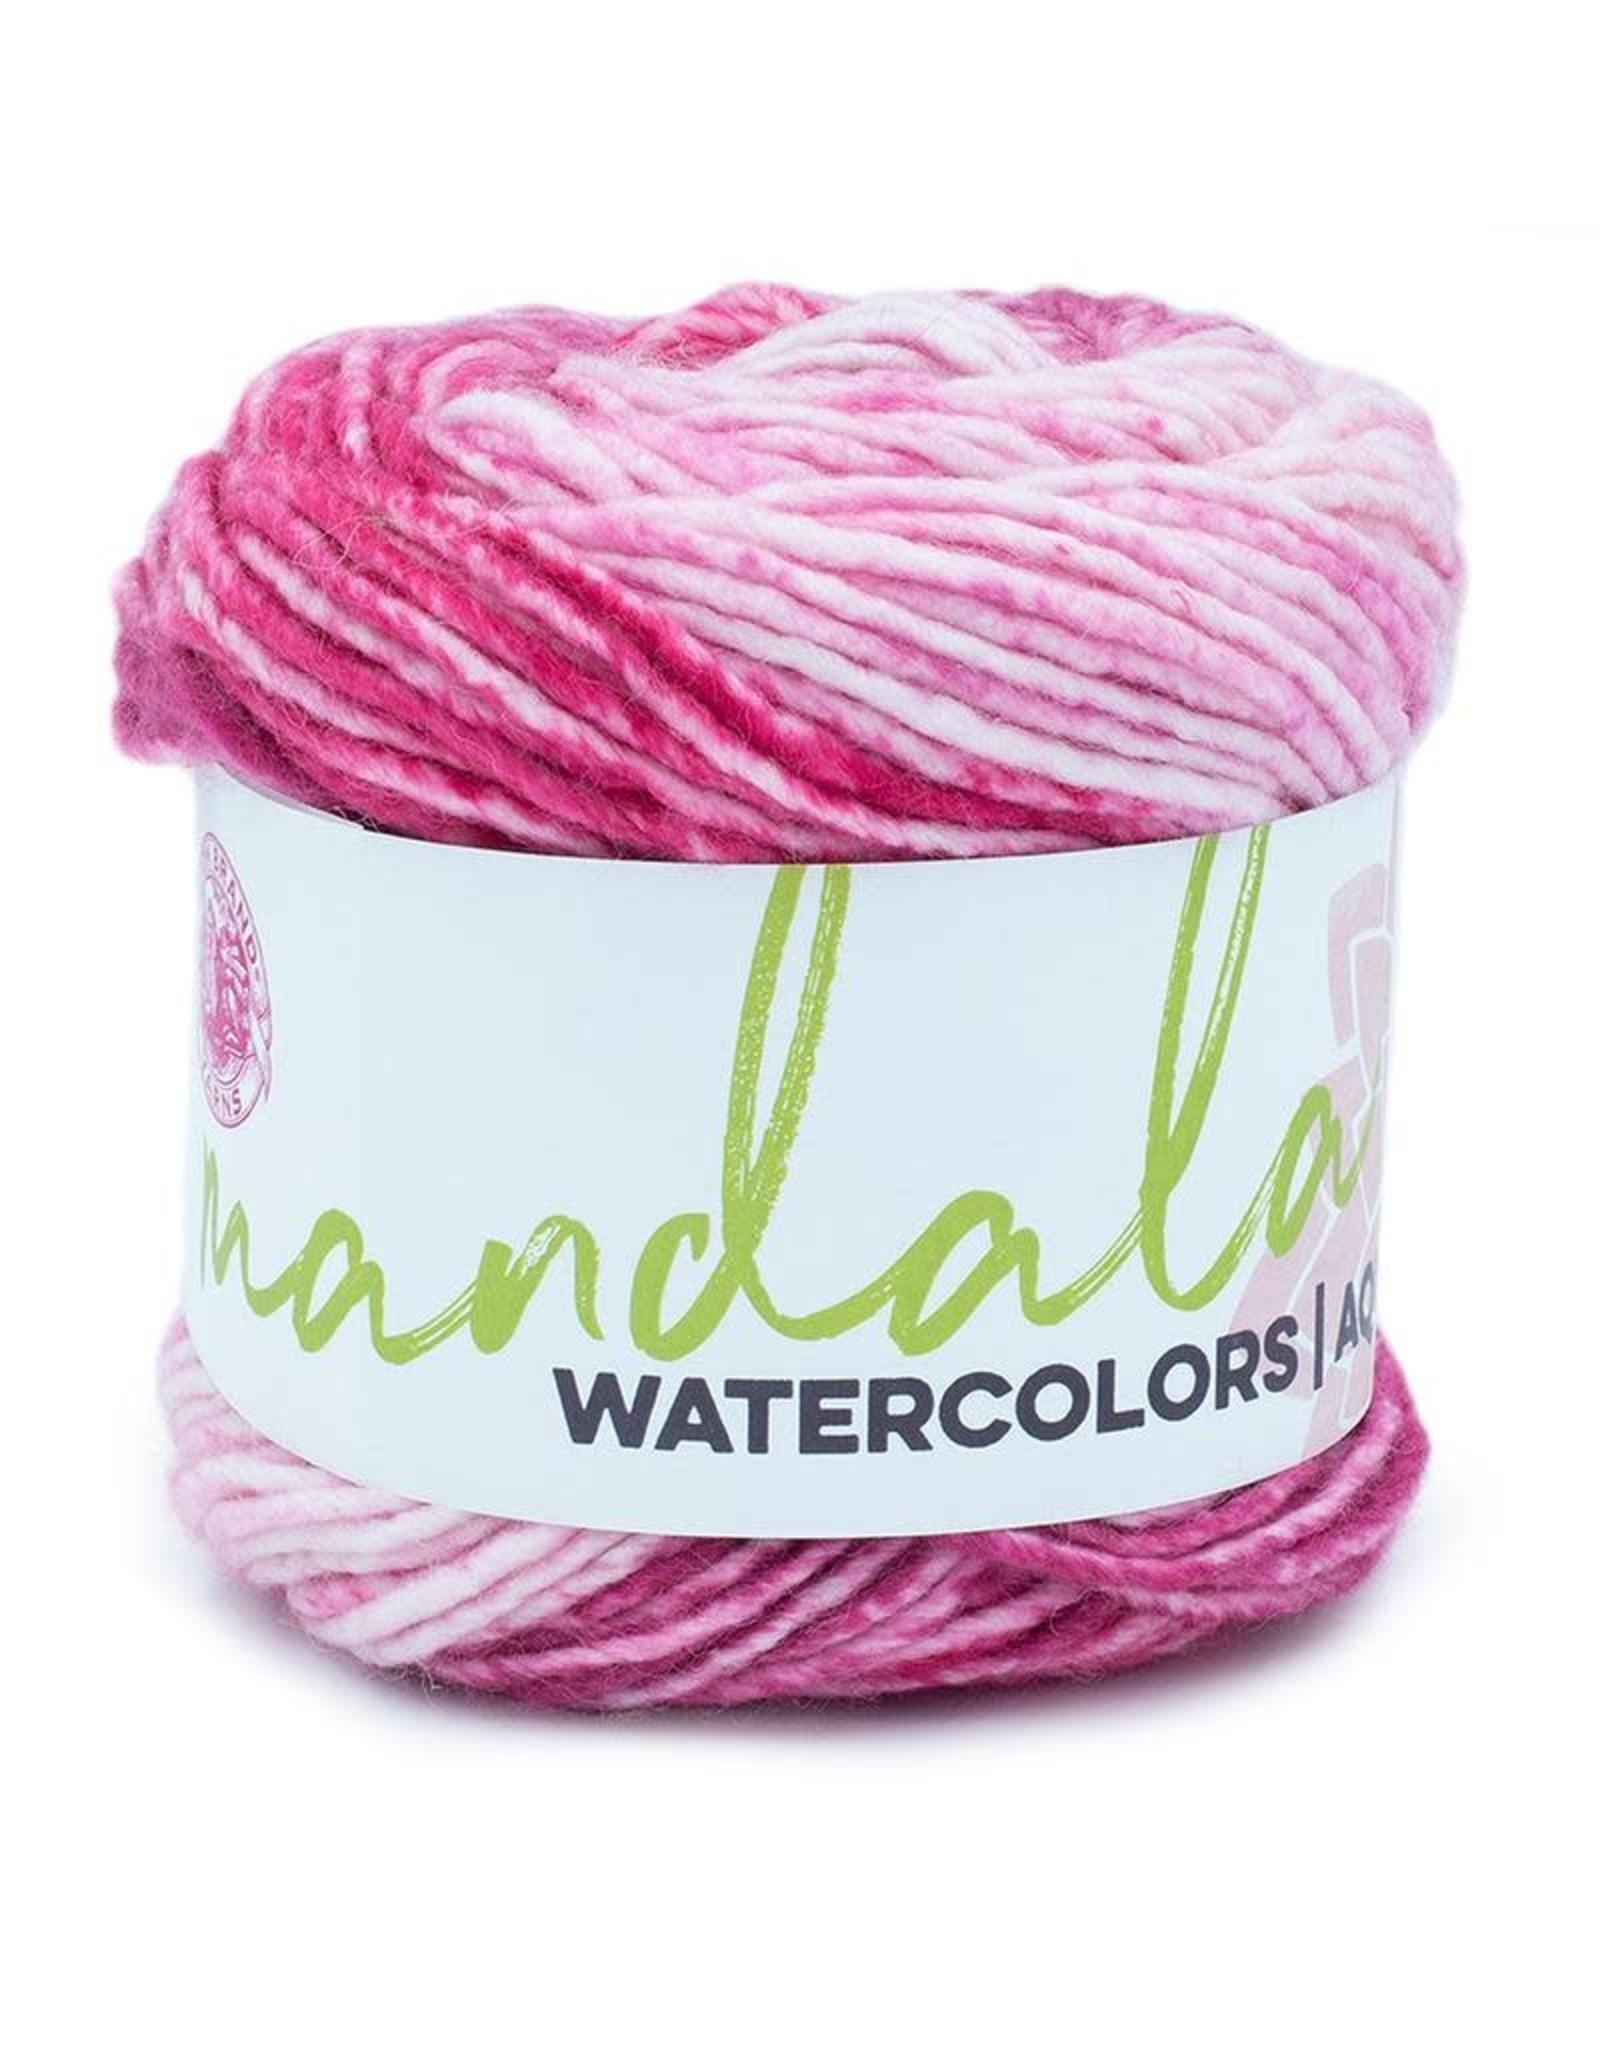 Teaberry - Mandala Watercolor - Lion Brand